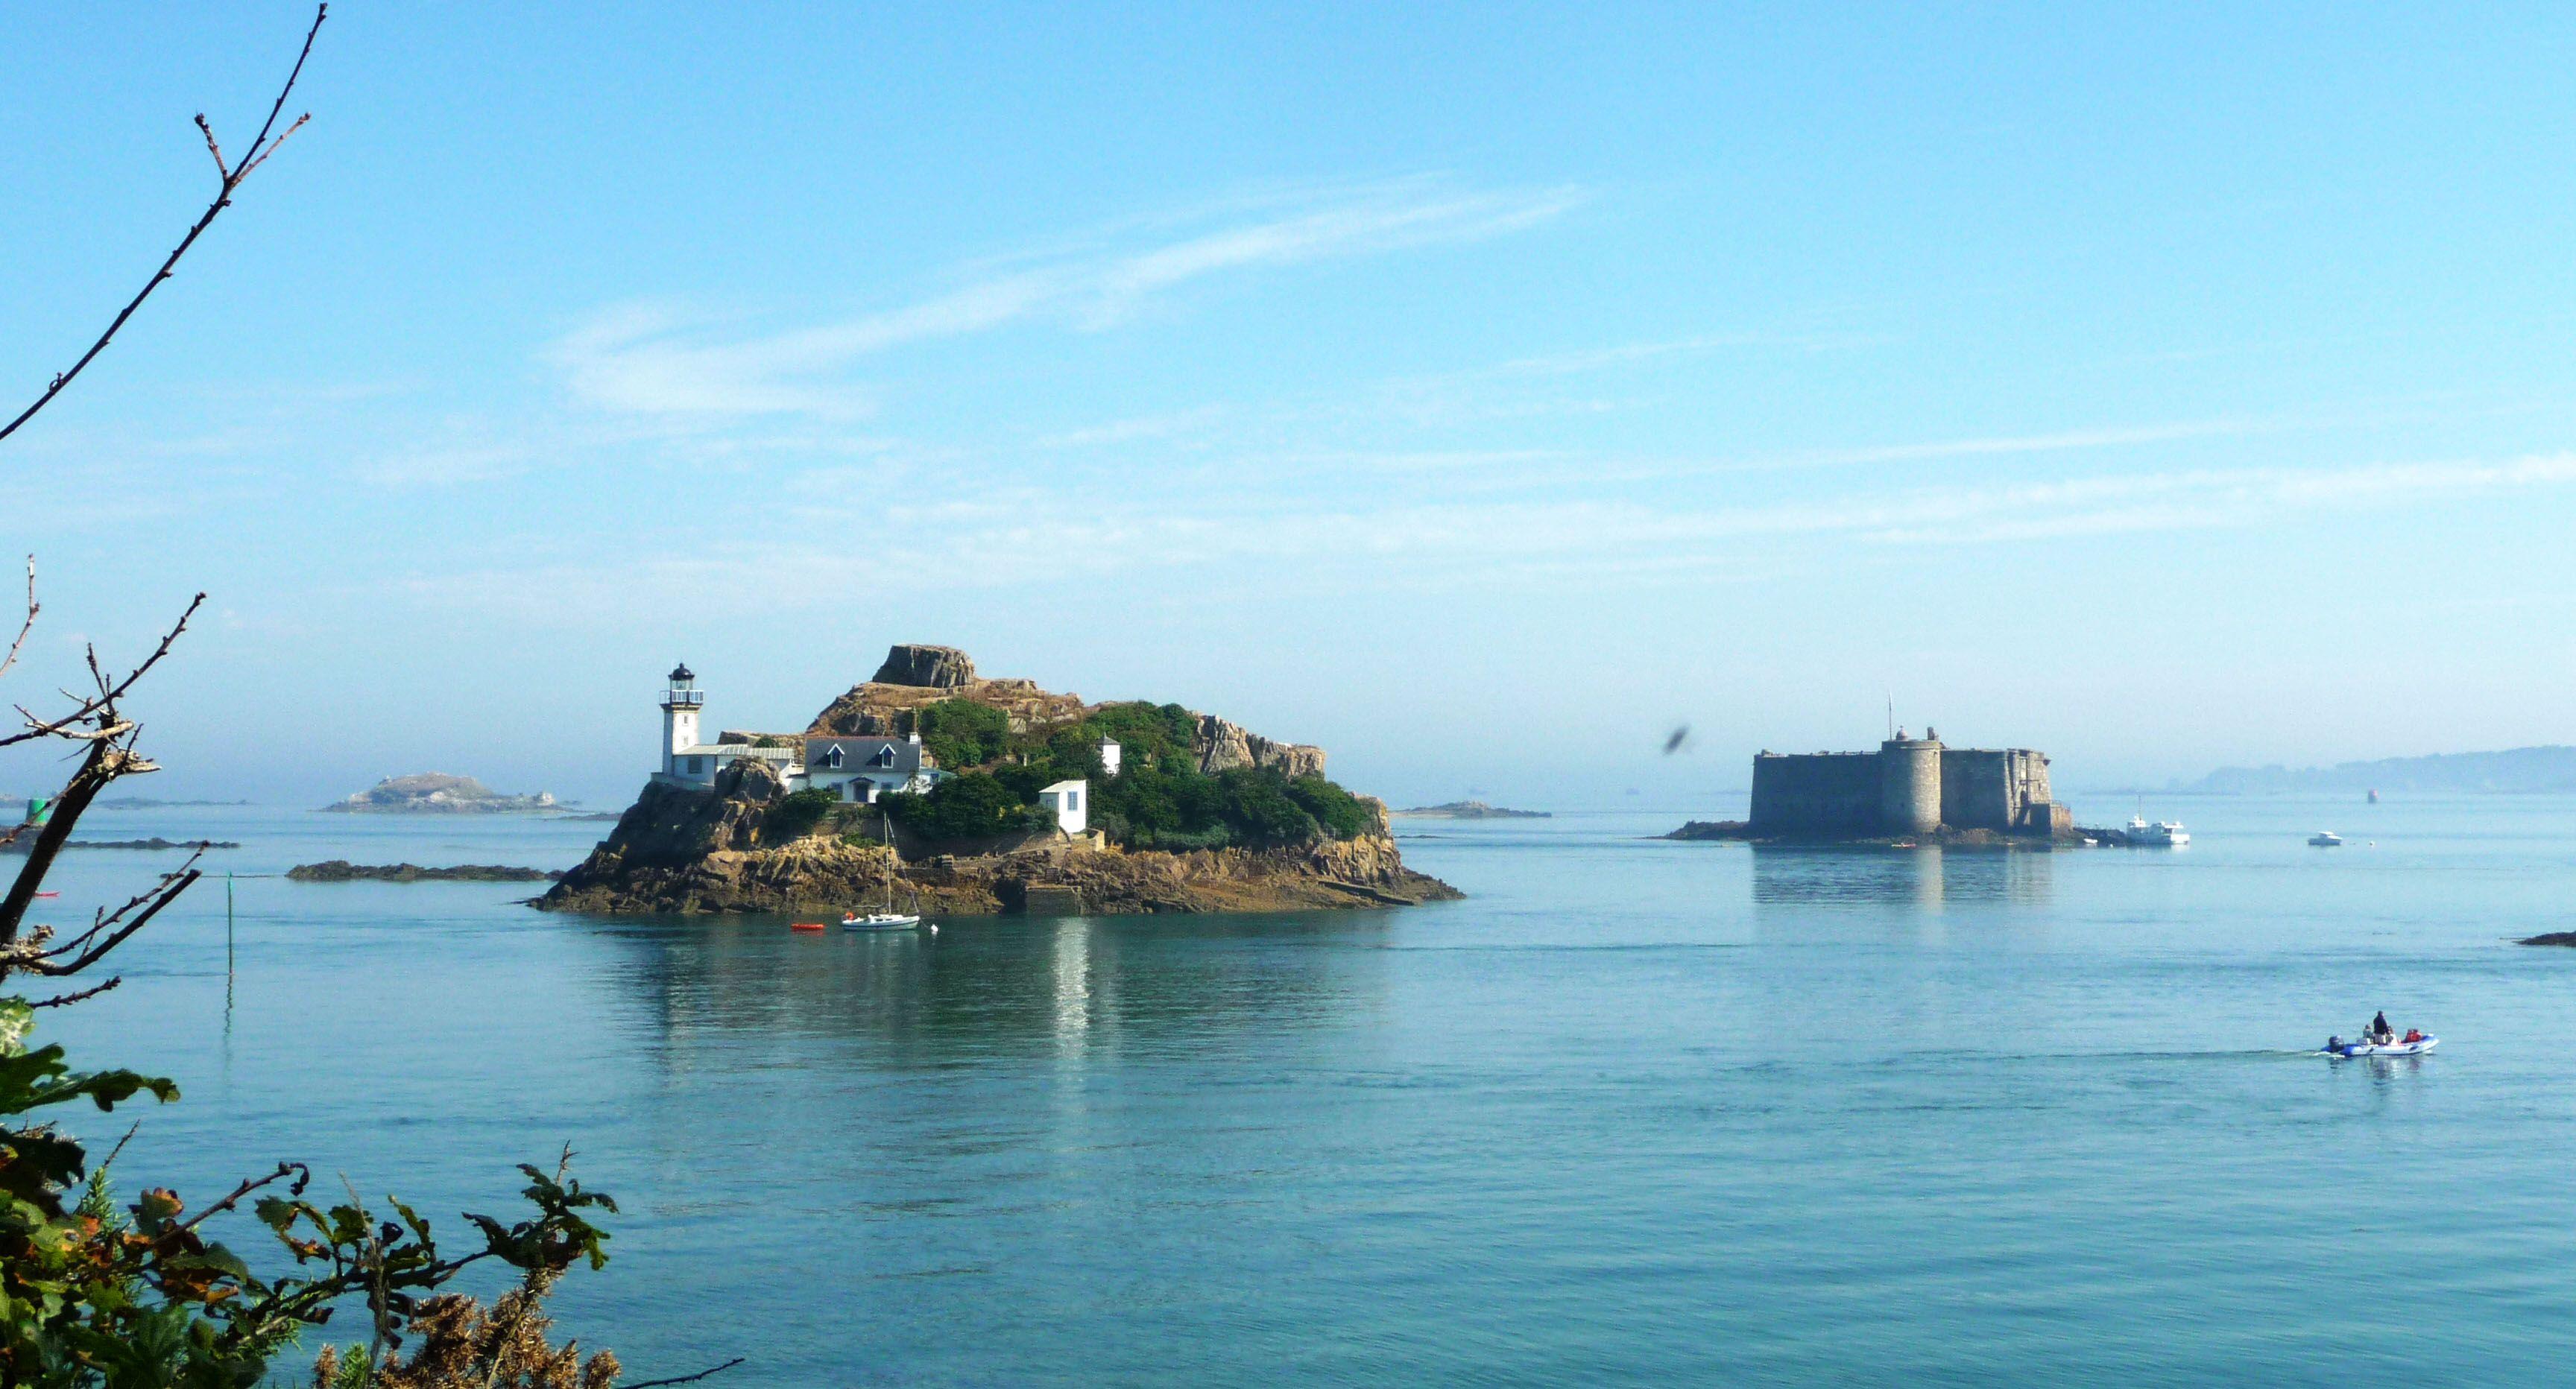 Hebergement Votre Hebergement De Vacances A Morlaix Bretagne